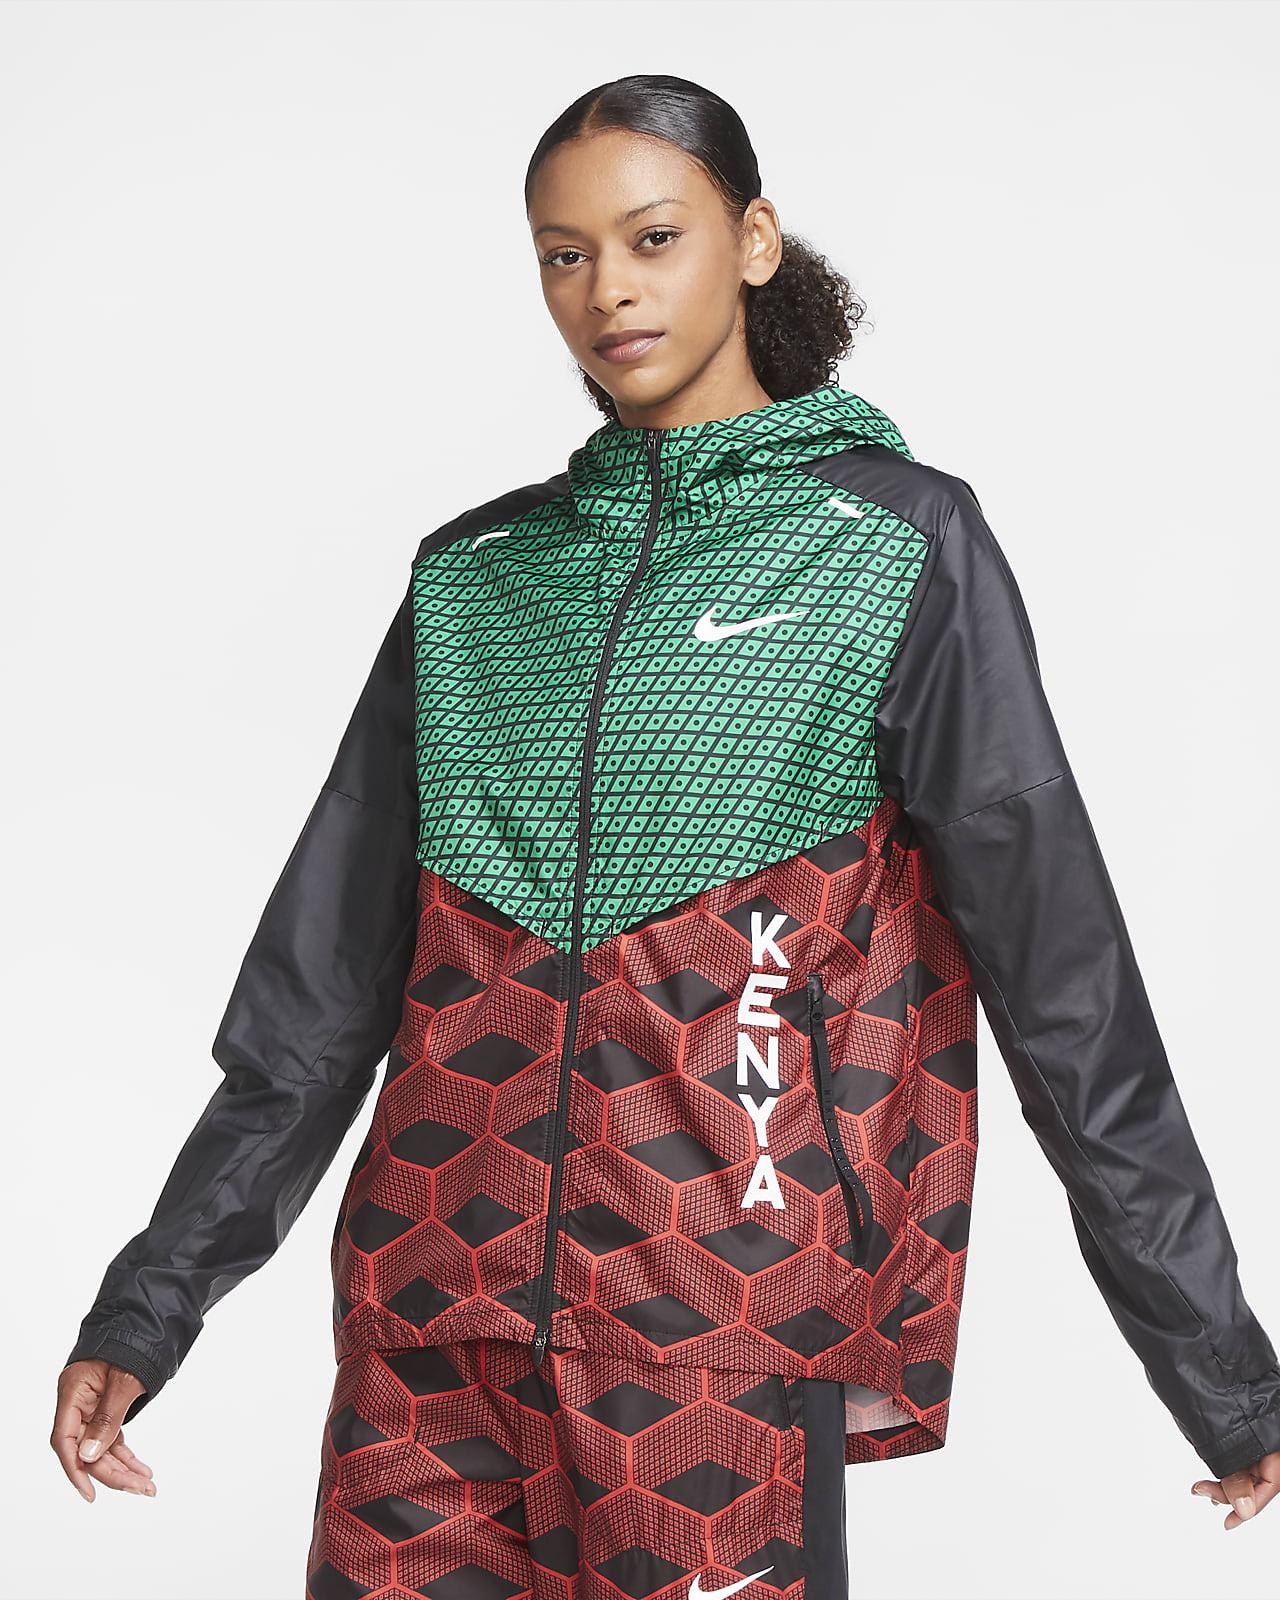 Nike Team Kenia Shieldrunner Laufjacke